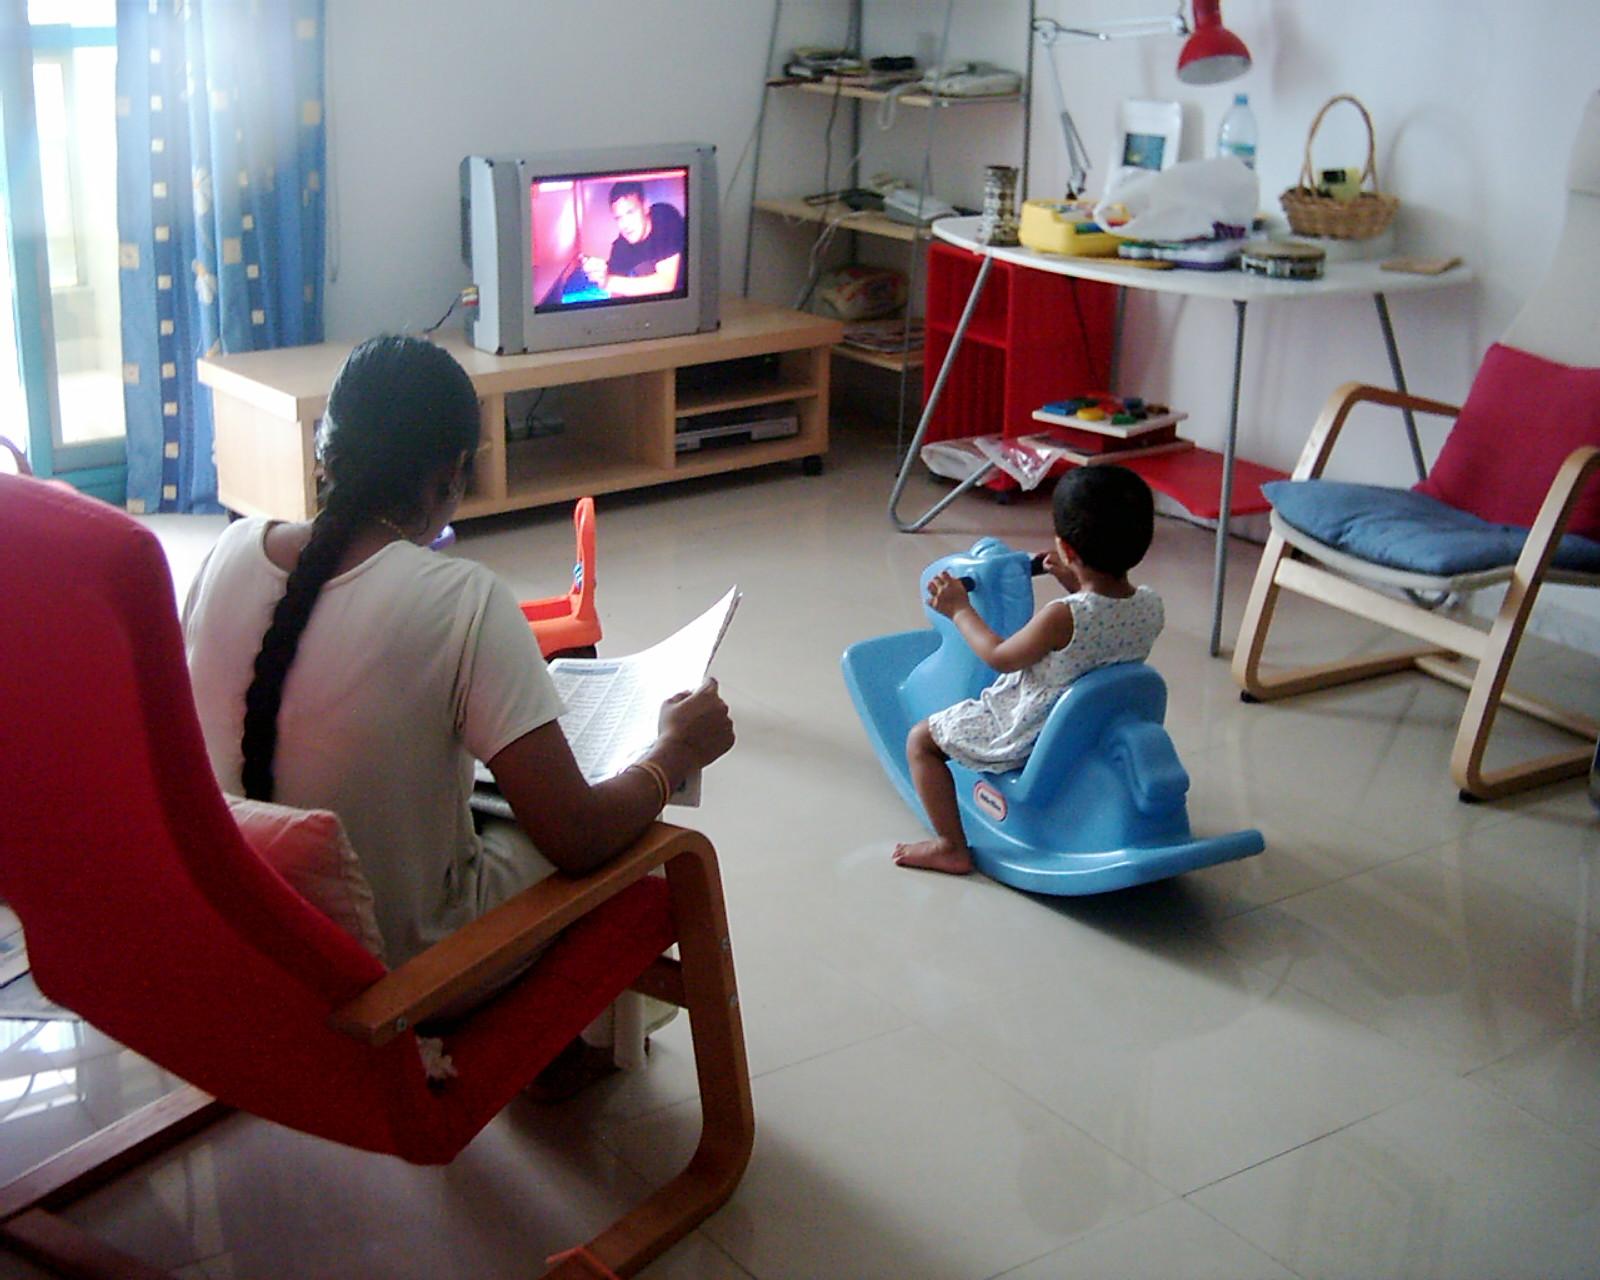 Initiating into responsible viewing, Dubai